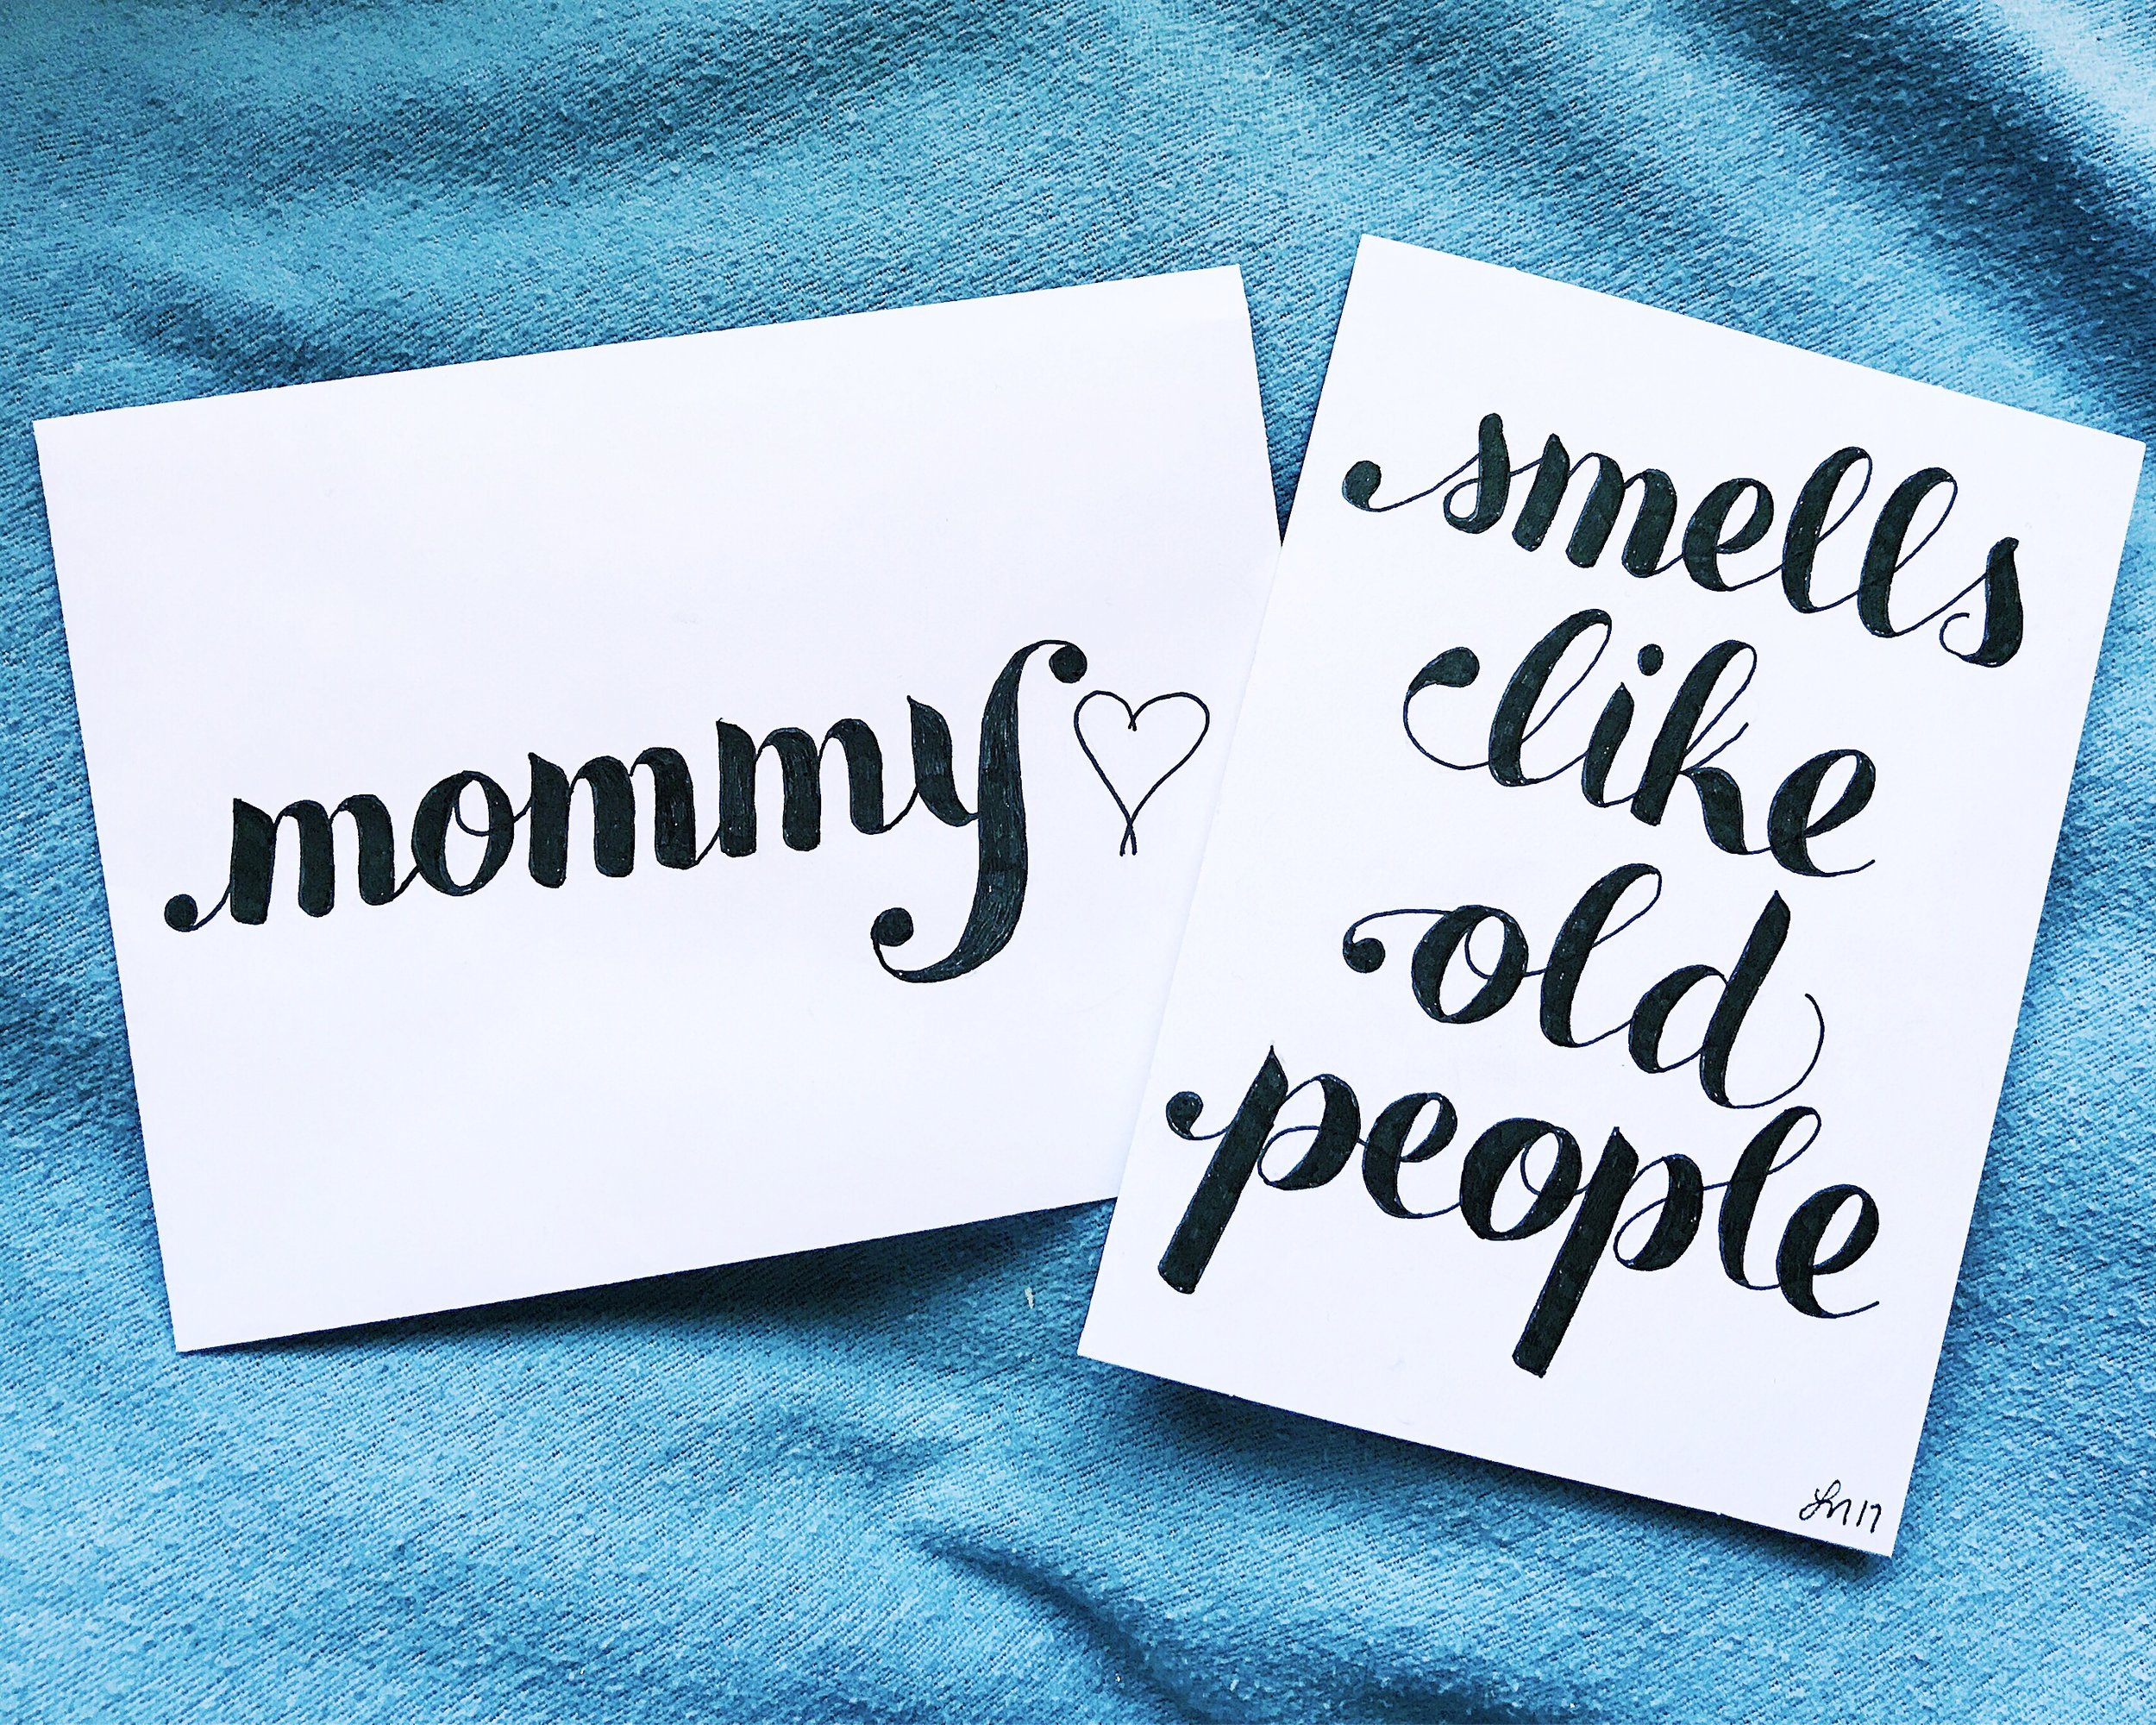 smells-like-old-people.jpg